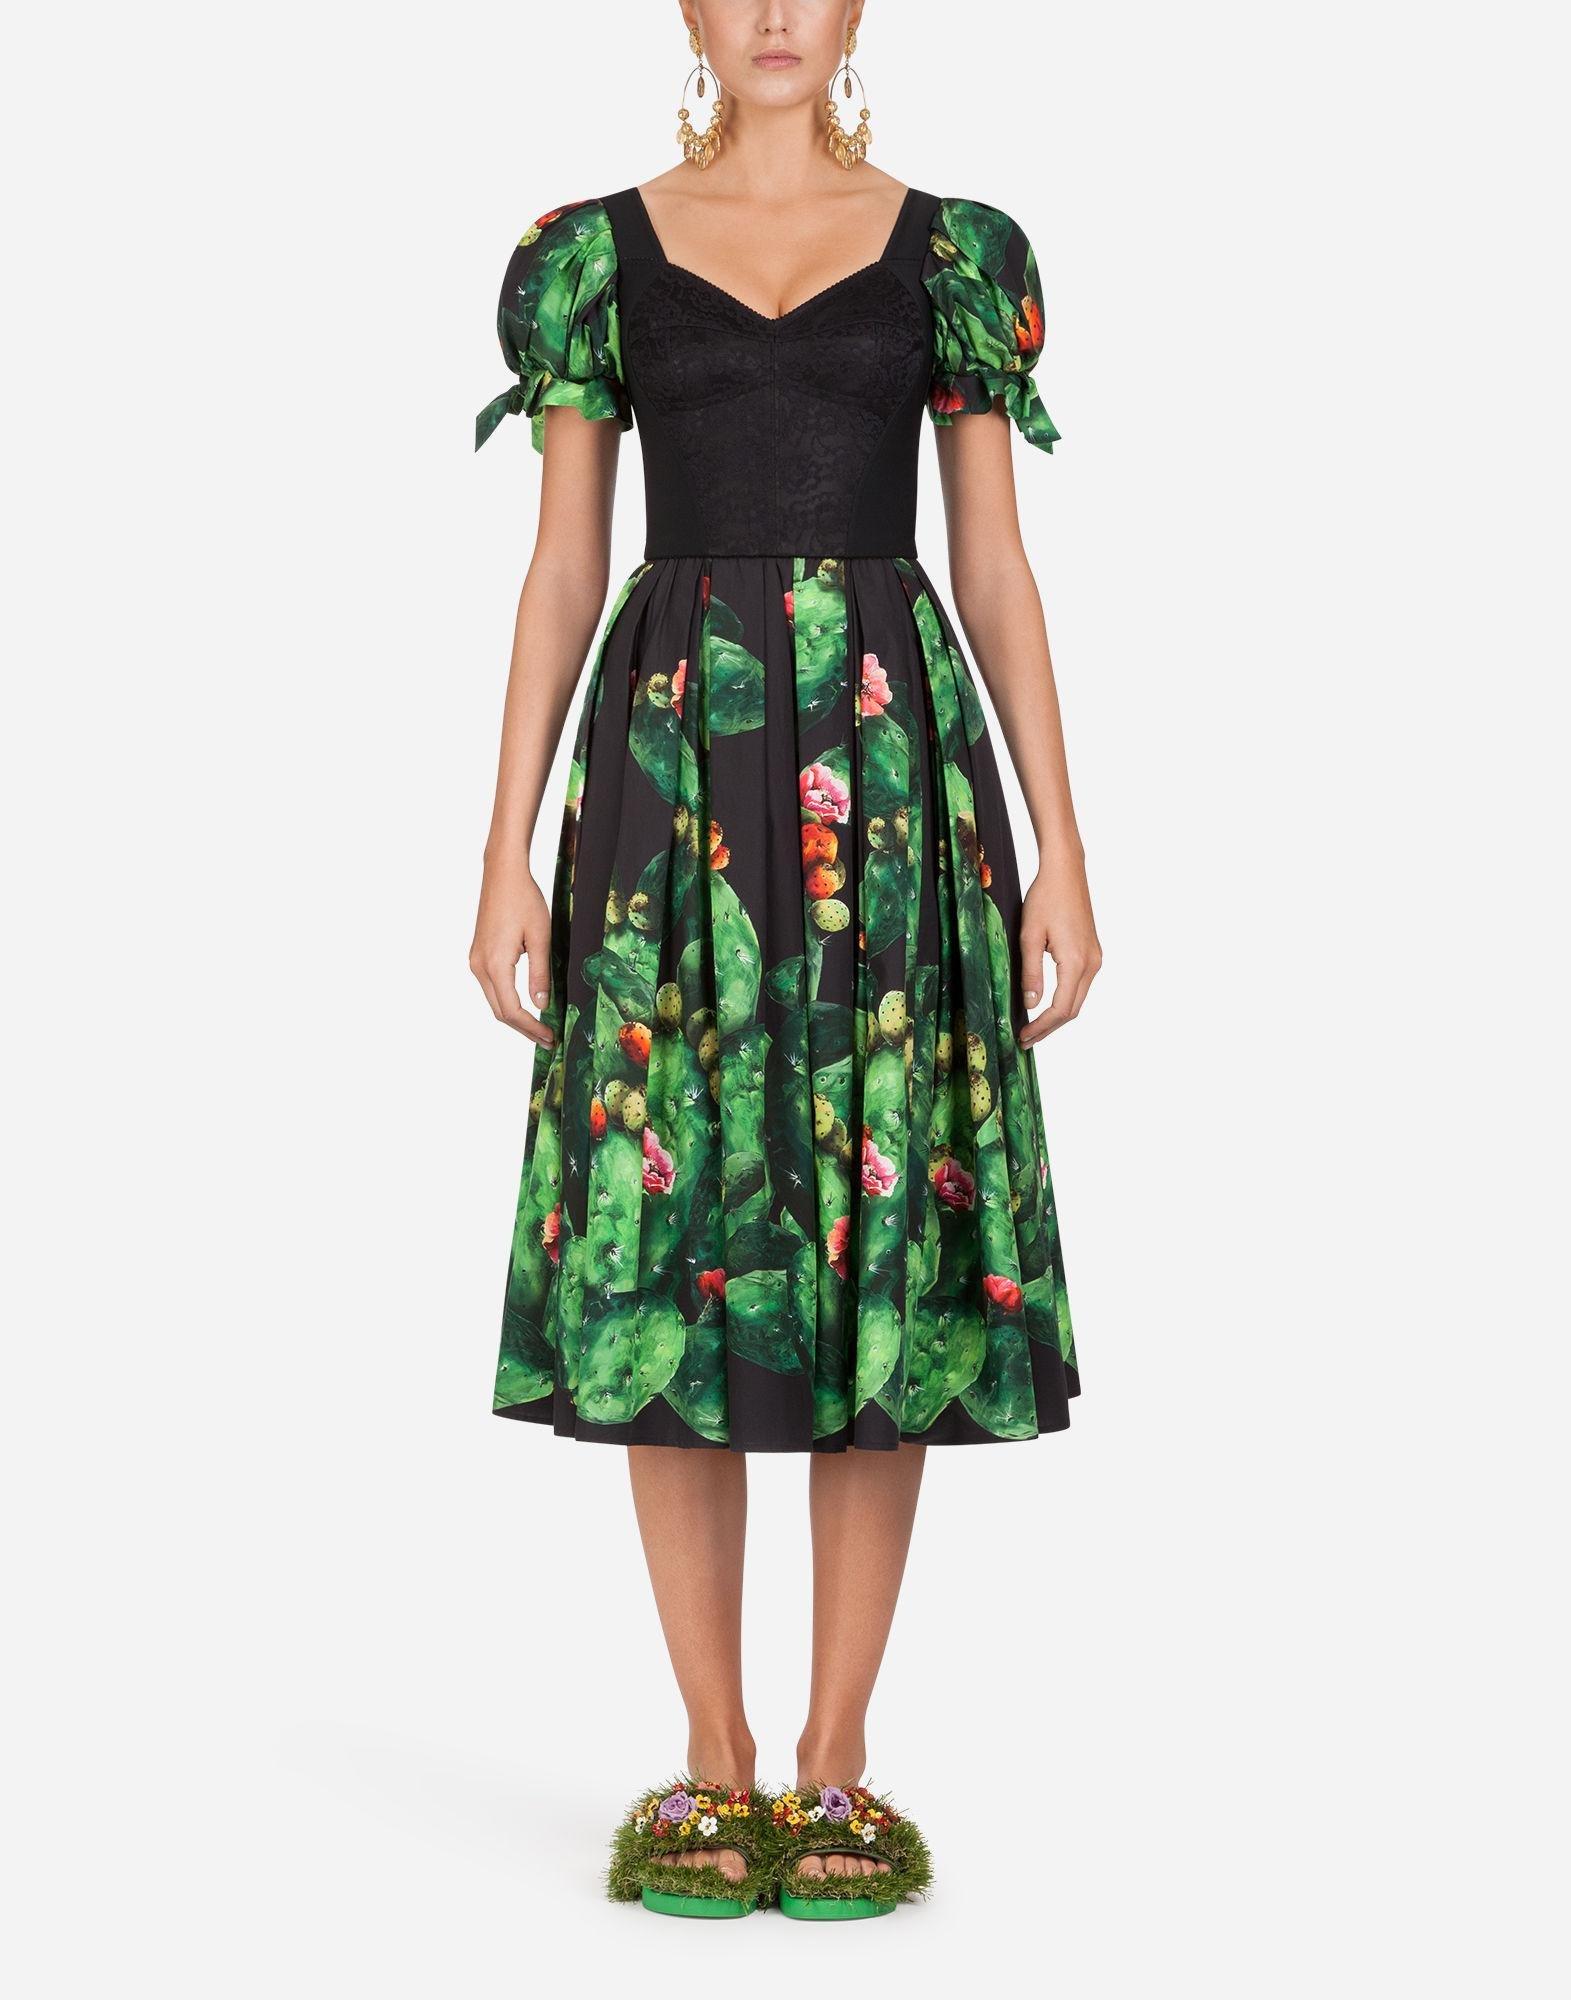 542a4780 Dolce & Gabbana Cactus-print Cotton Dress in Green - Lyst